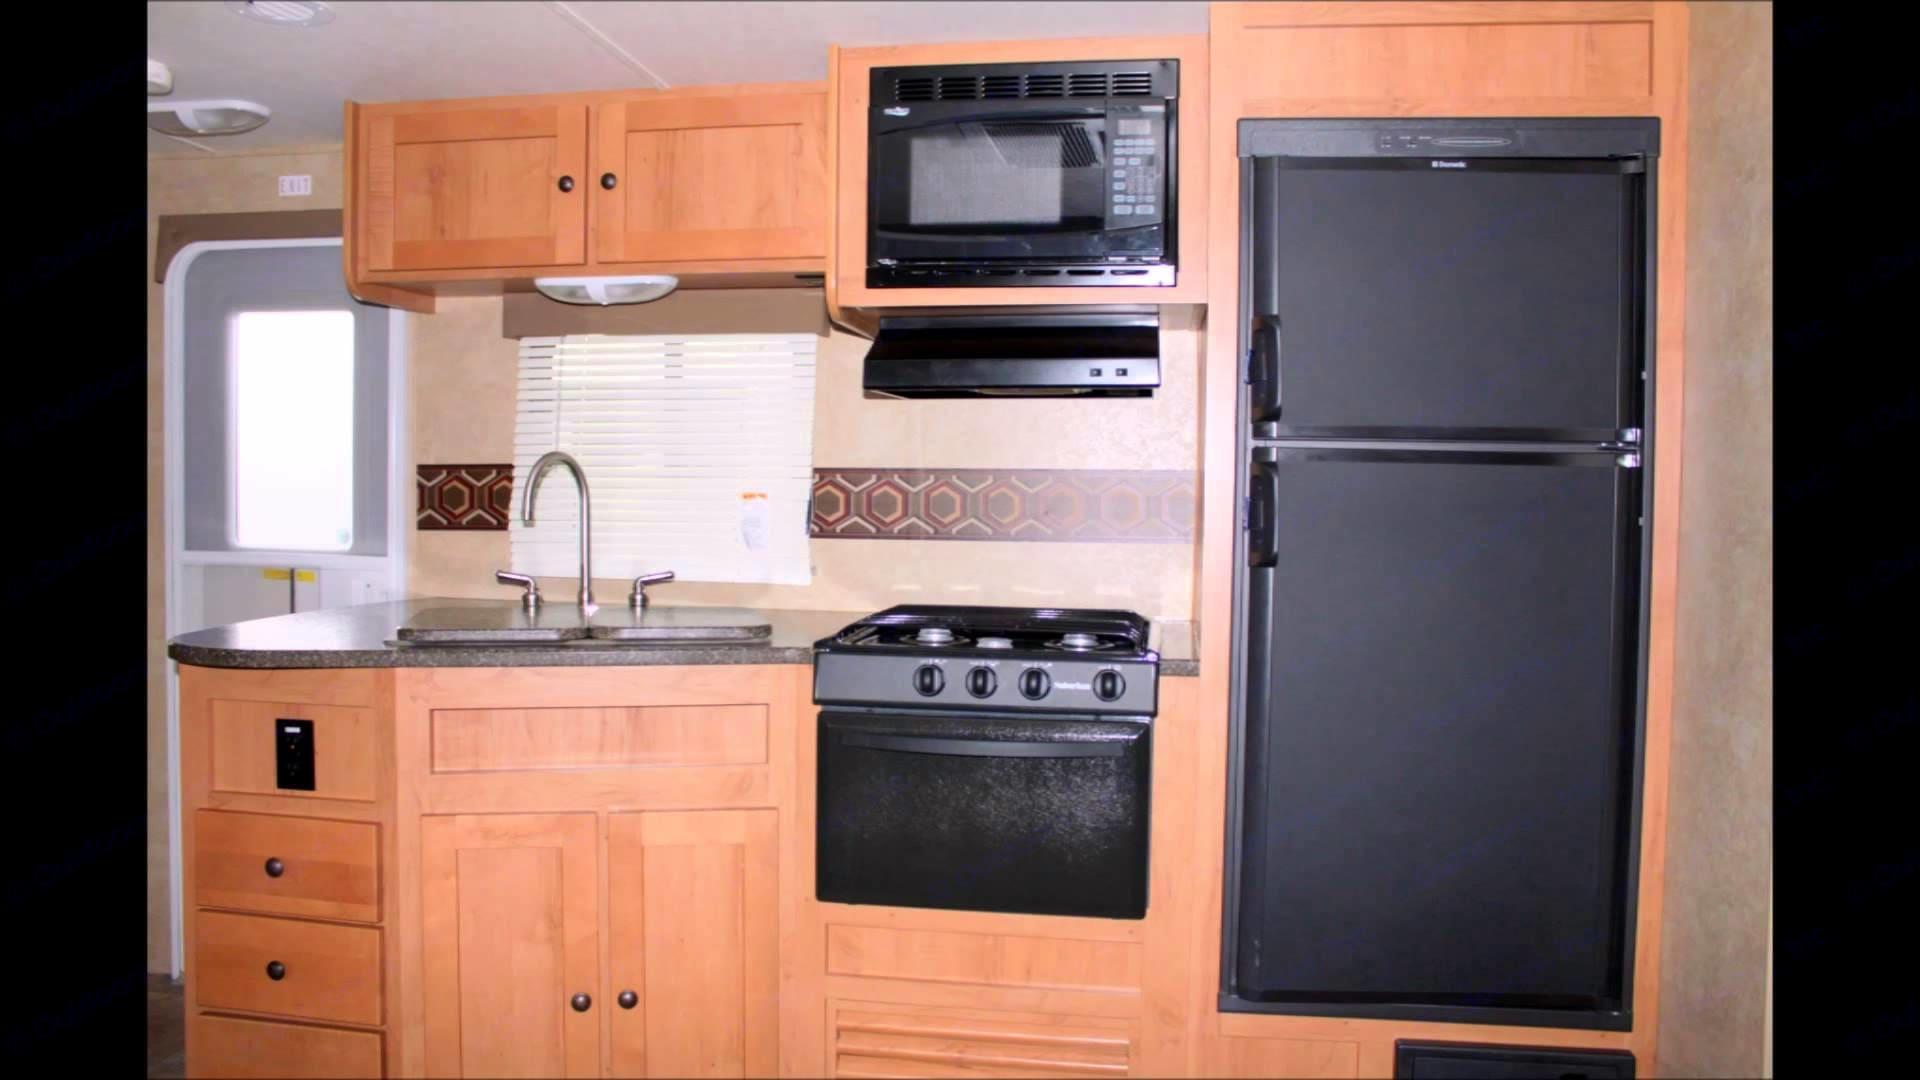 Gas oven/stove, gas/electric fridge.. Cruiser Rv Corp Shadow Cruiser 2012